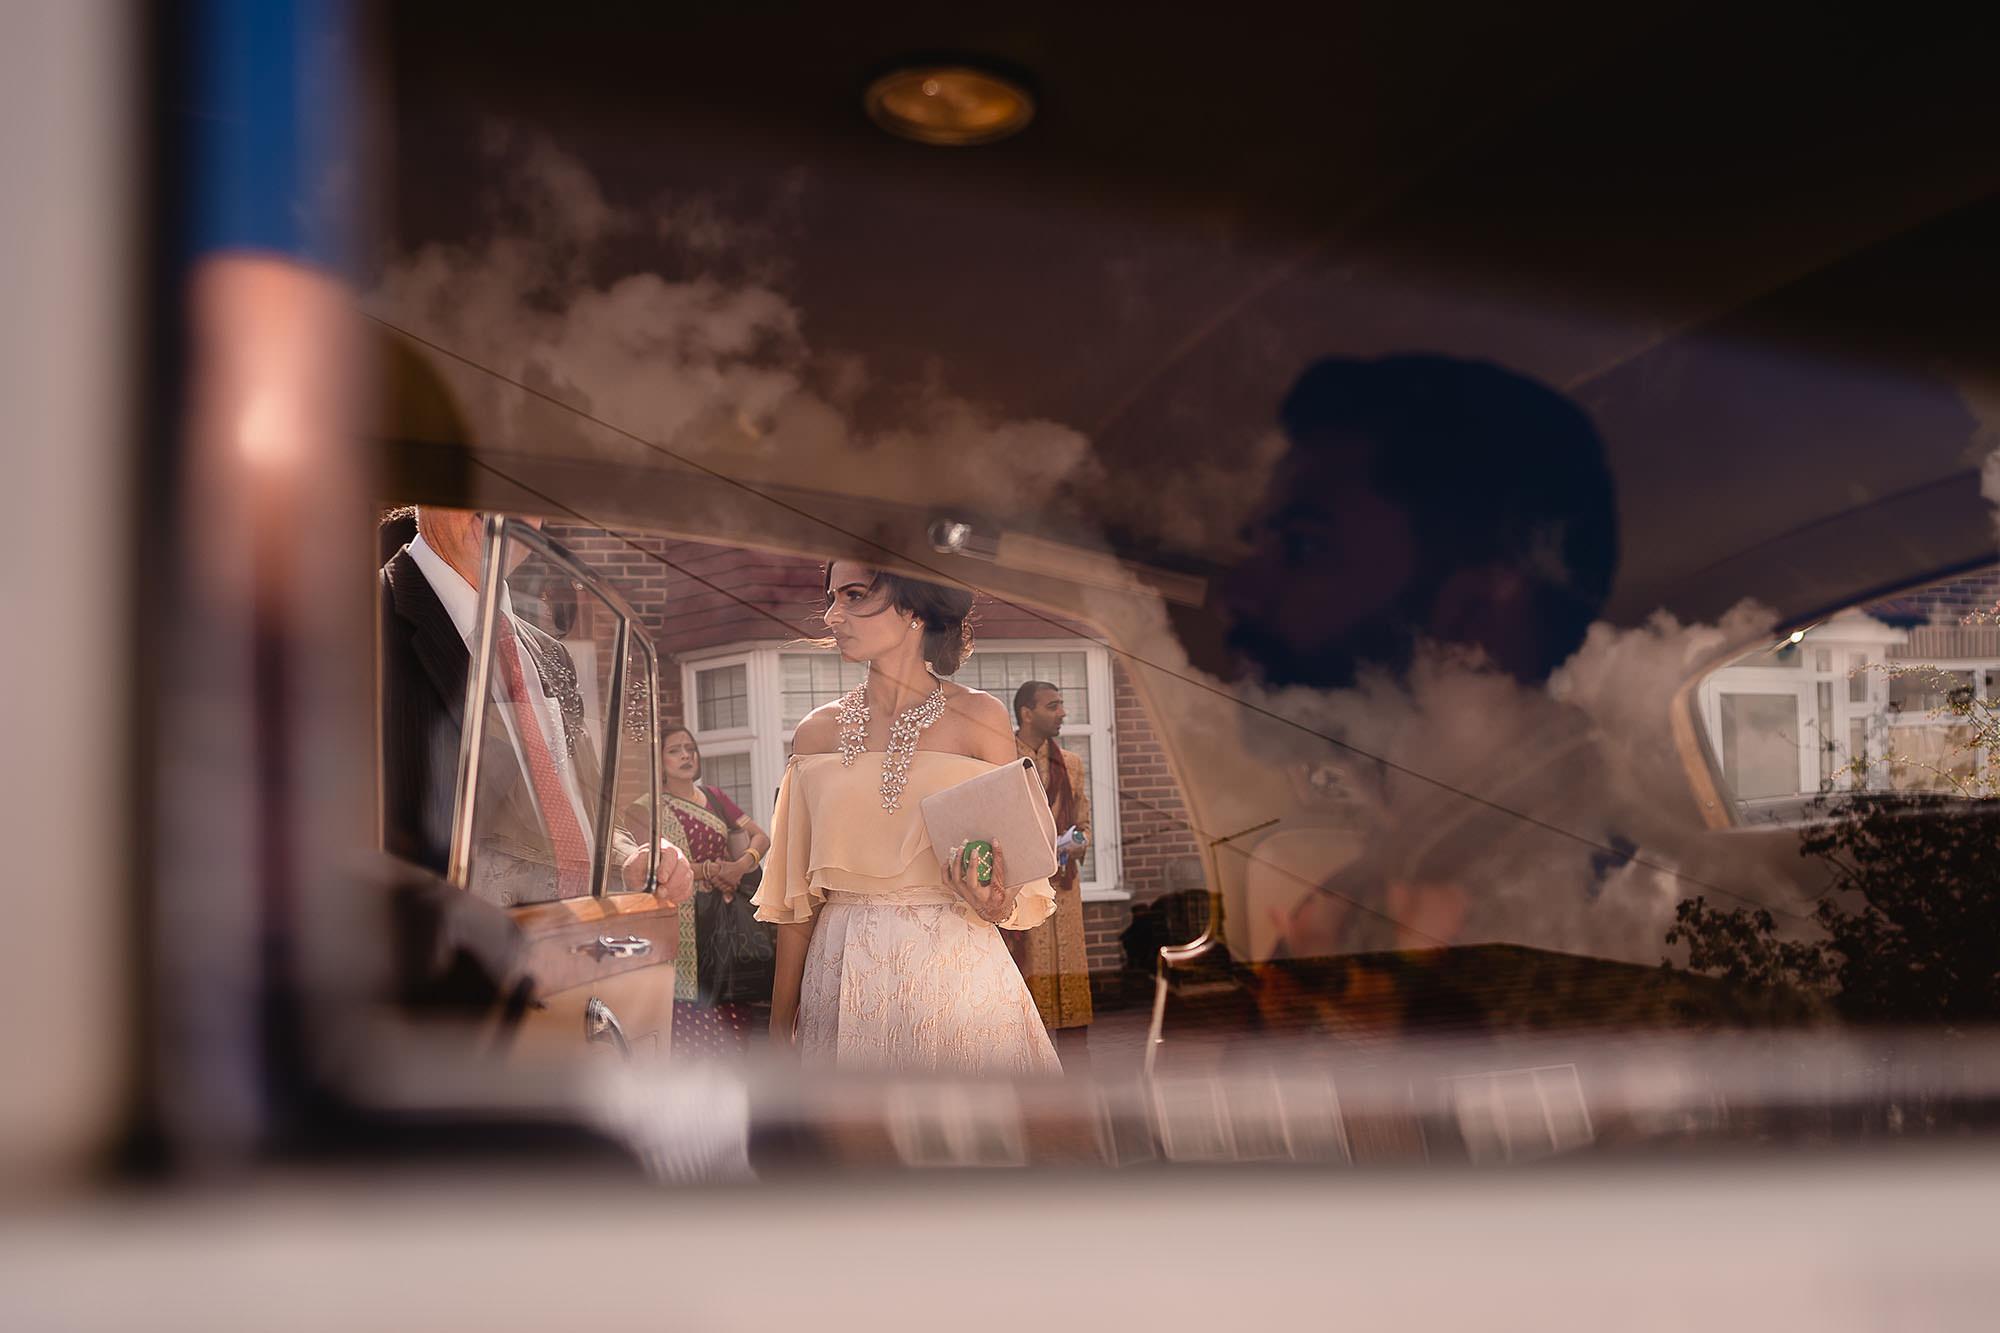 groom waiting in wedding car